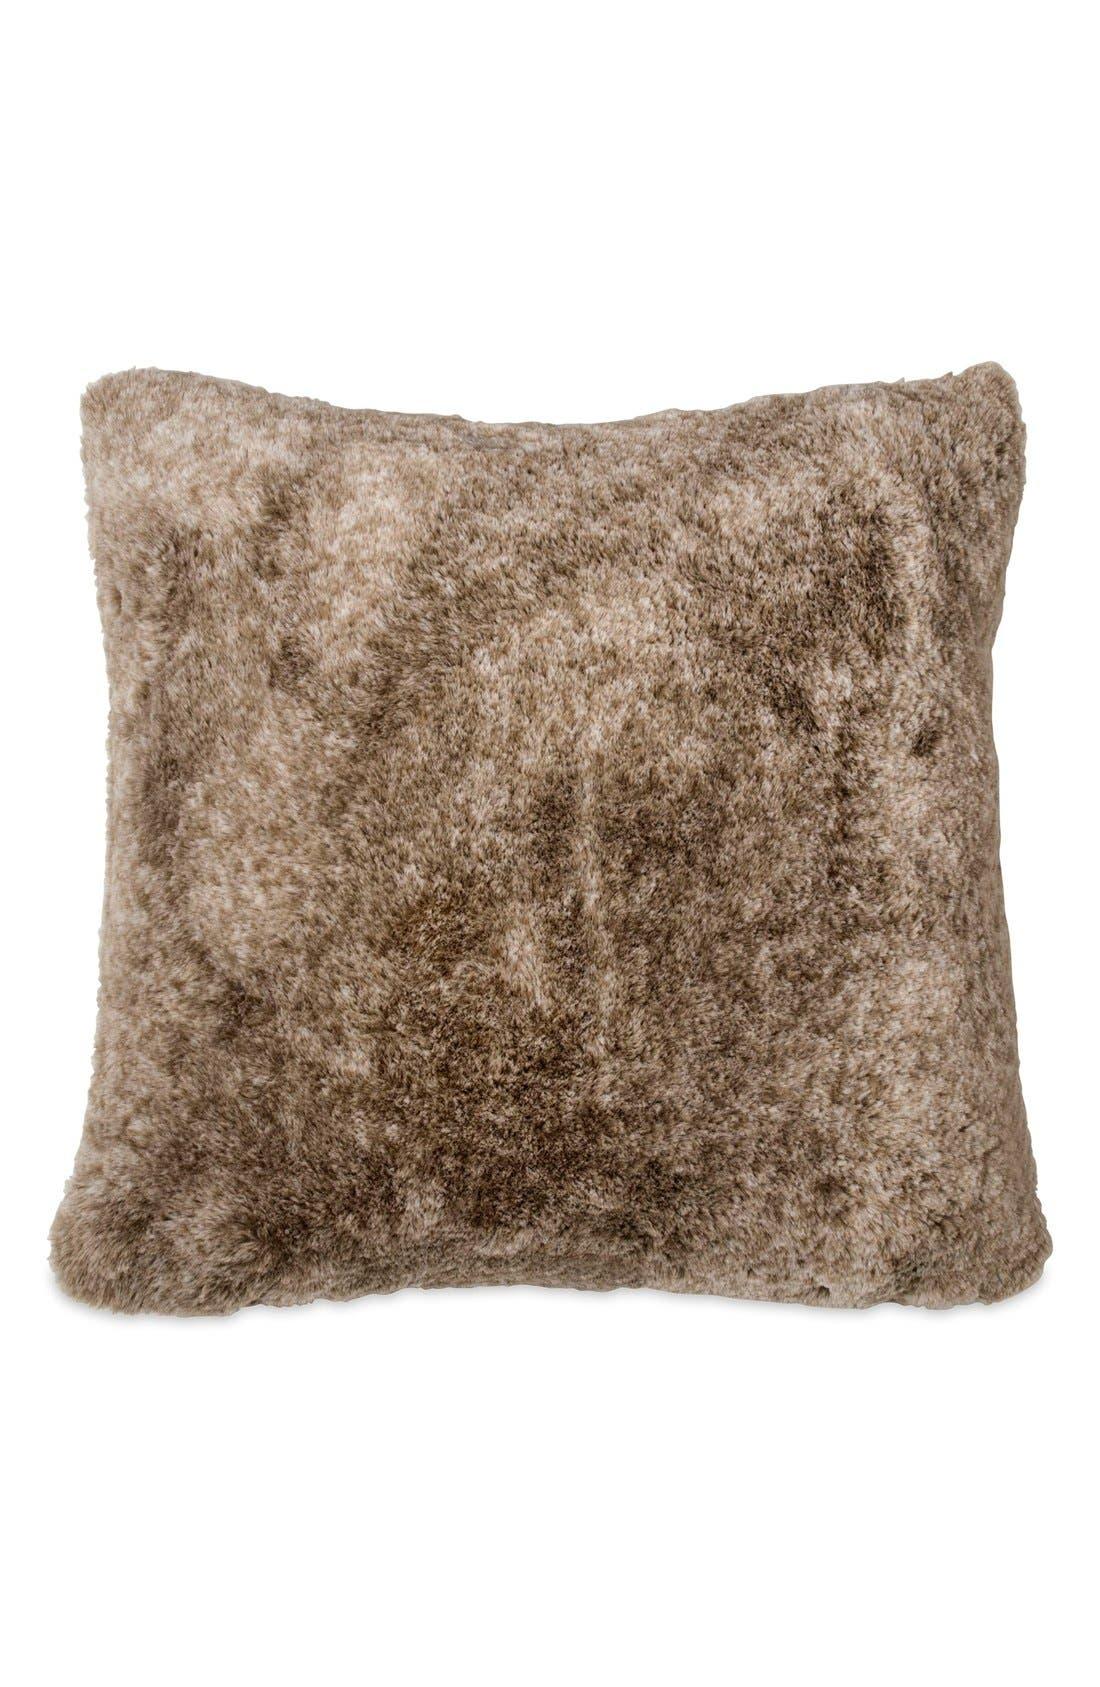 DKNY 'Loft Stripe' Pillow